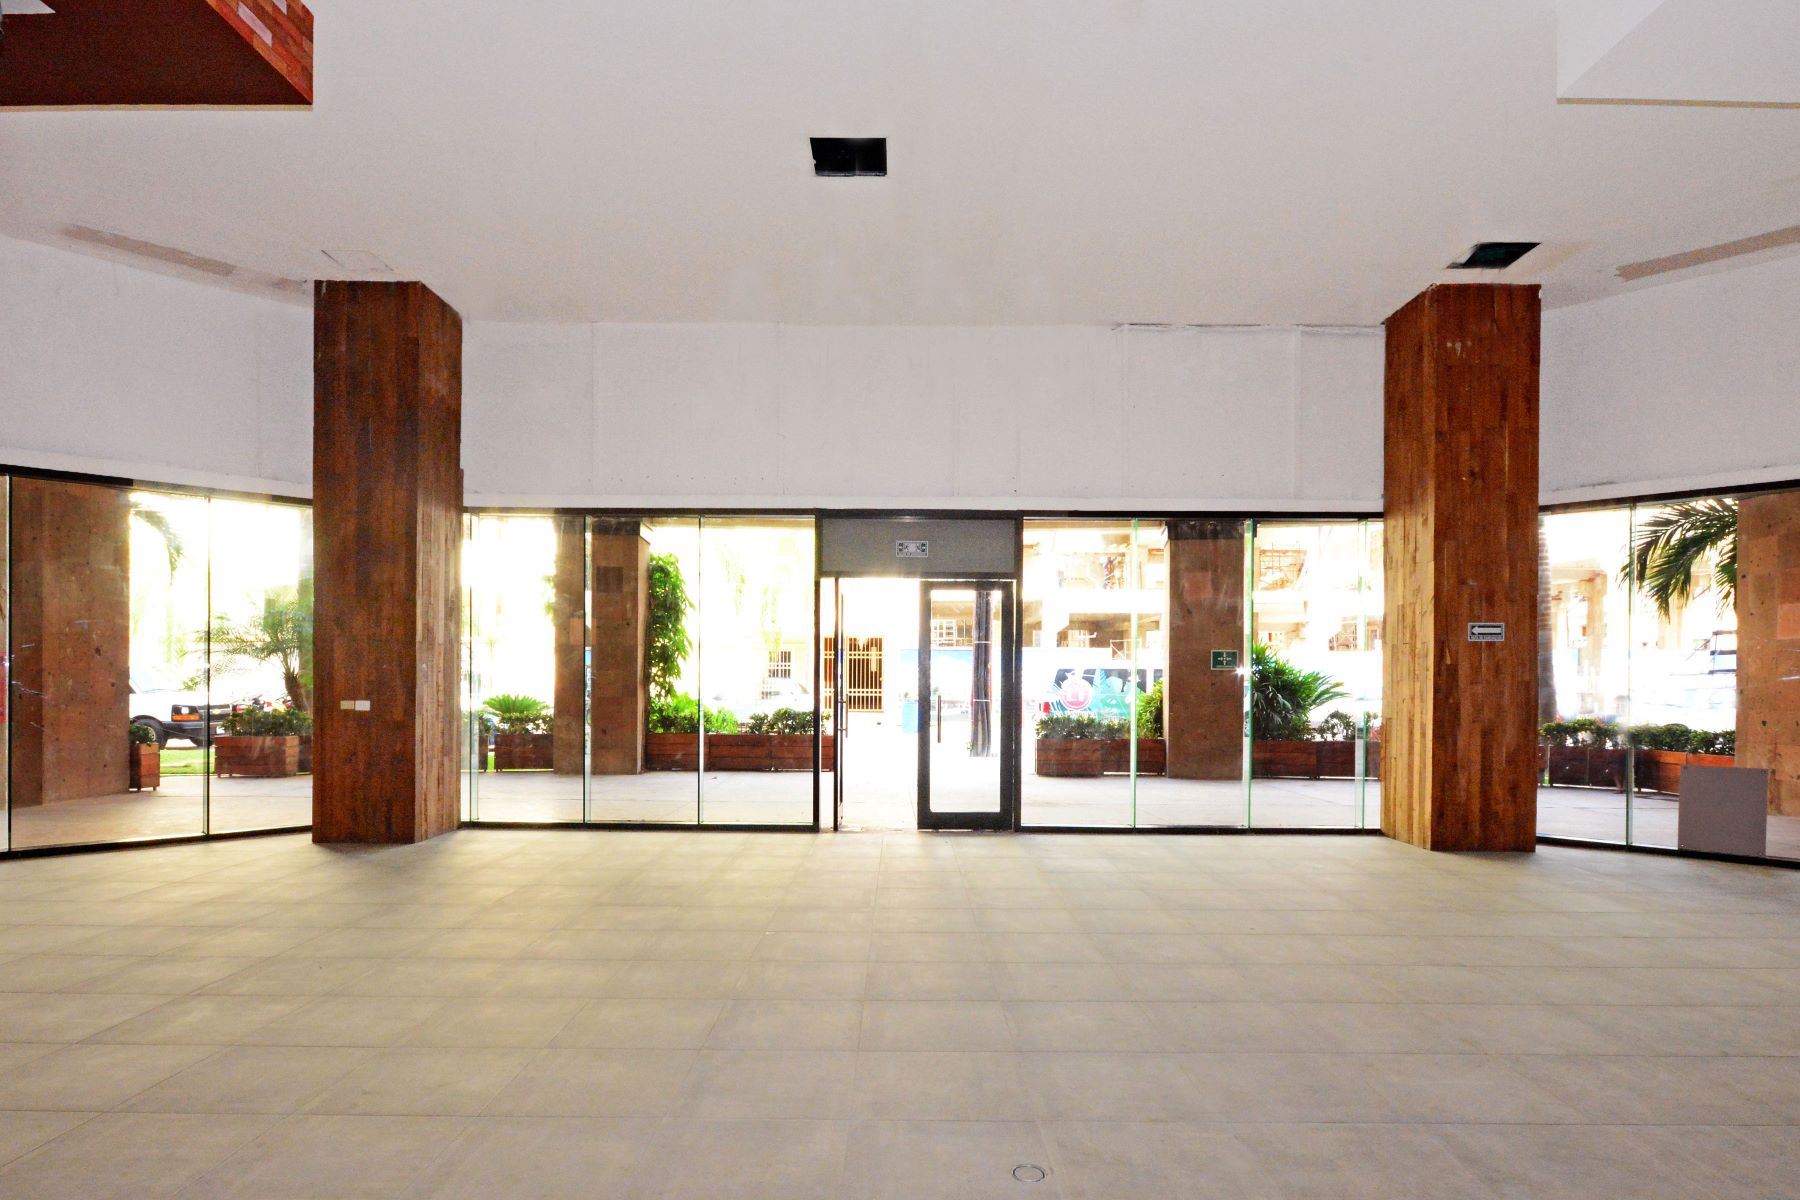 Additional photo for property listing at LOCAL 22 ALDEA THAI Aldea Thai #22 Avenida Cozumel entre las Calles 26 y 28 Norte Playa Del Carmen, Quintana Roo 77710 México